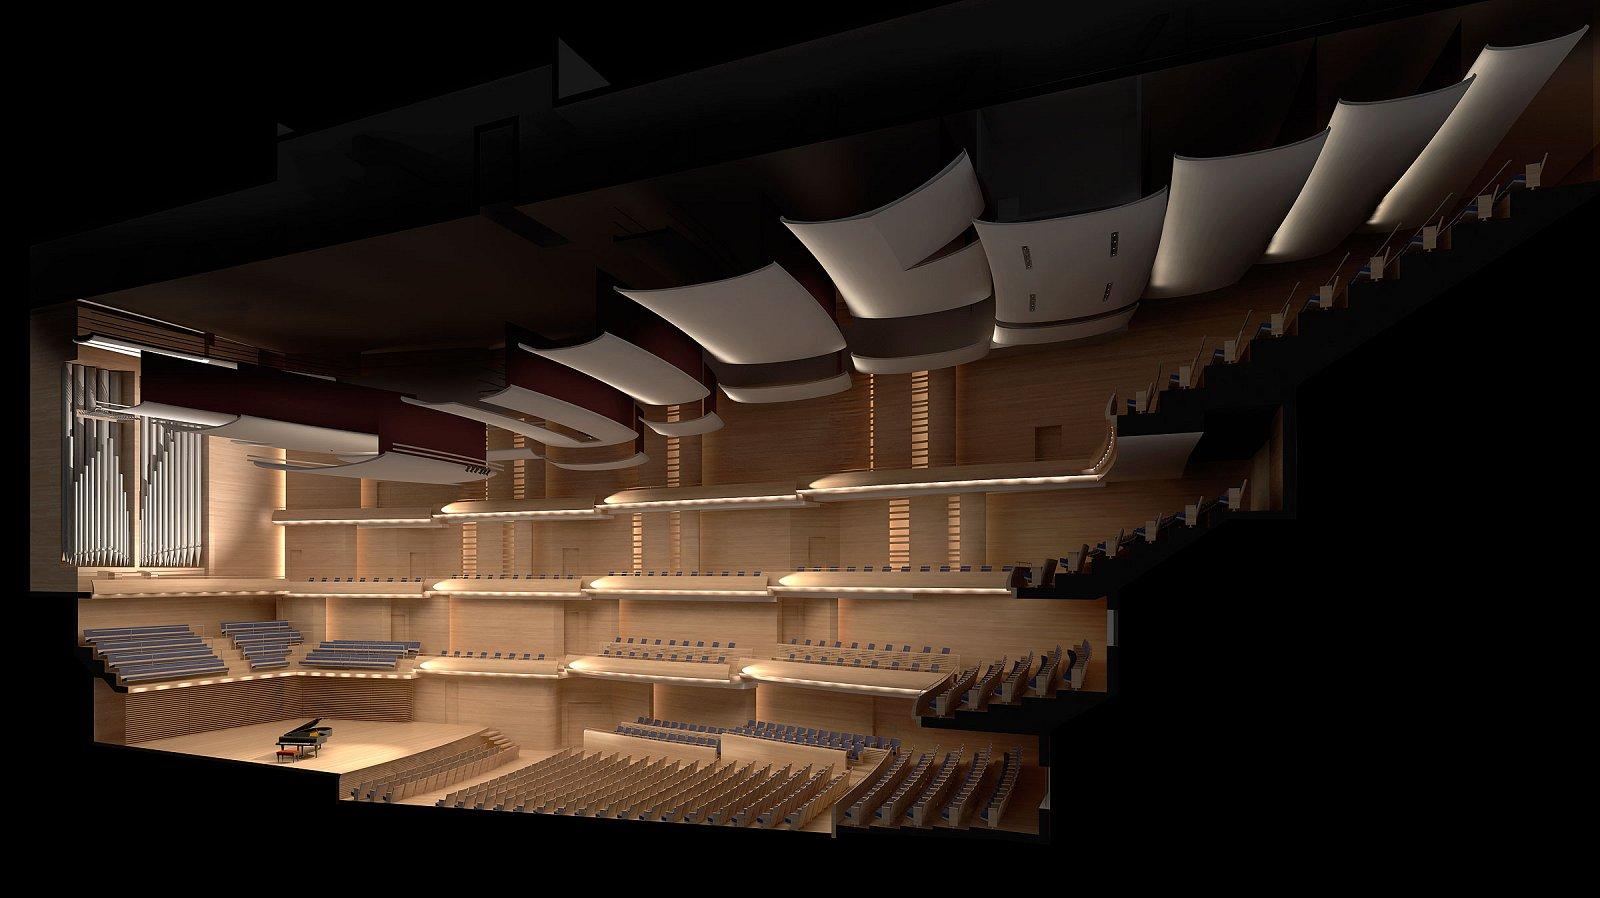 Concert Hall Montreal Gazette By Diamon And Schimitt